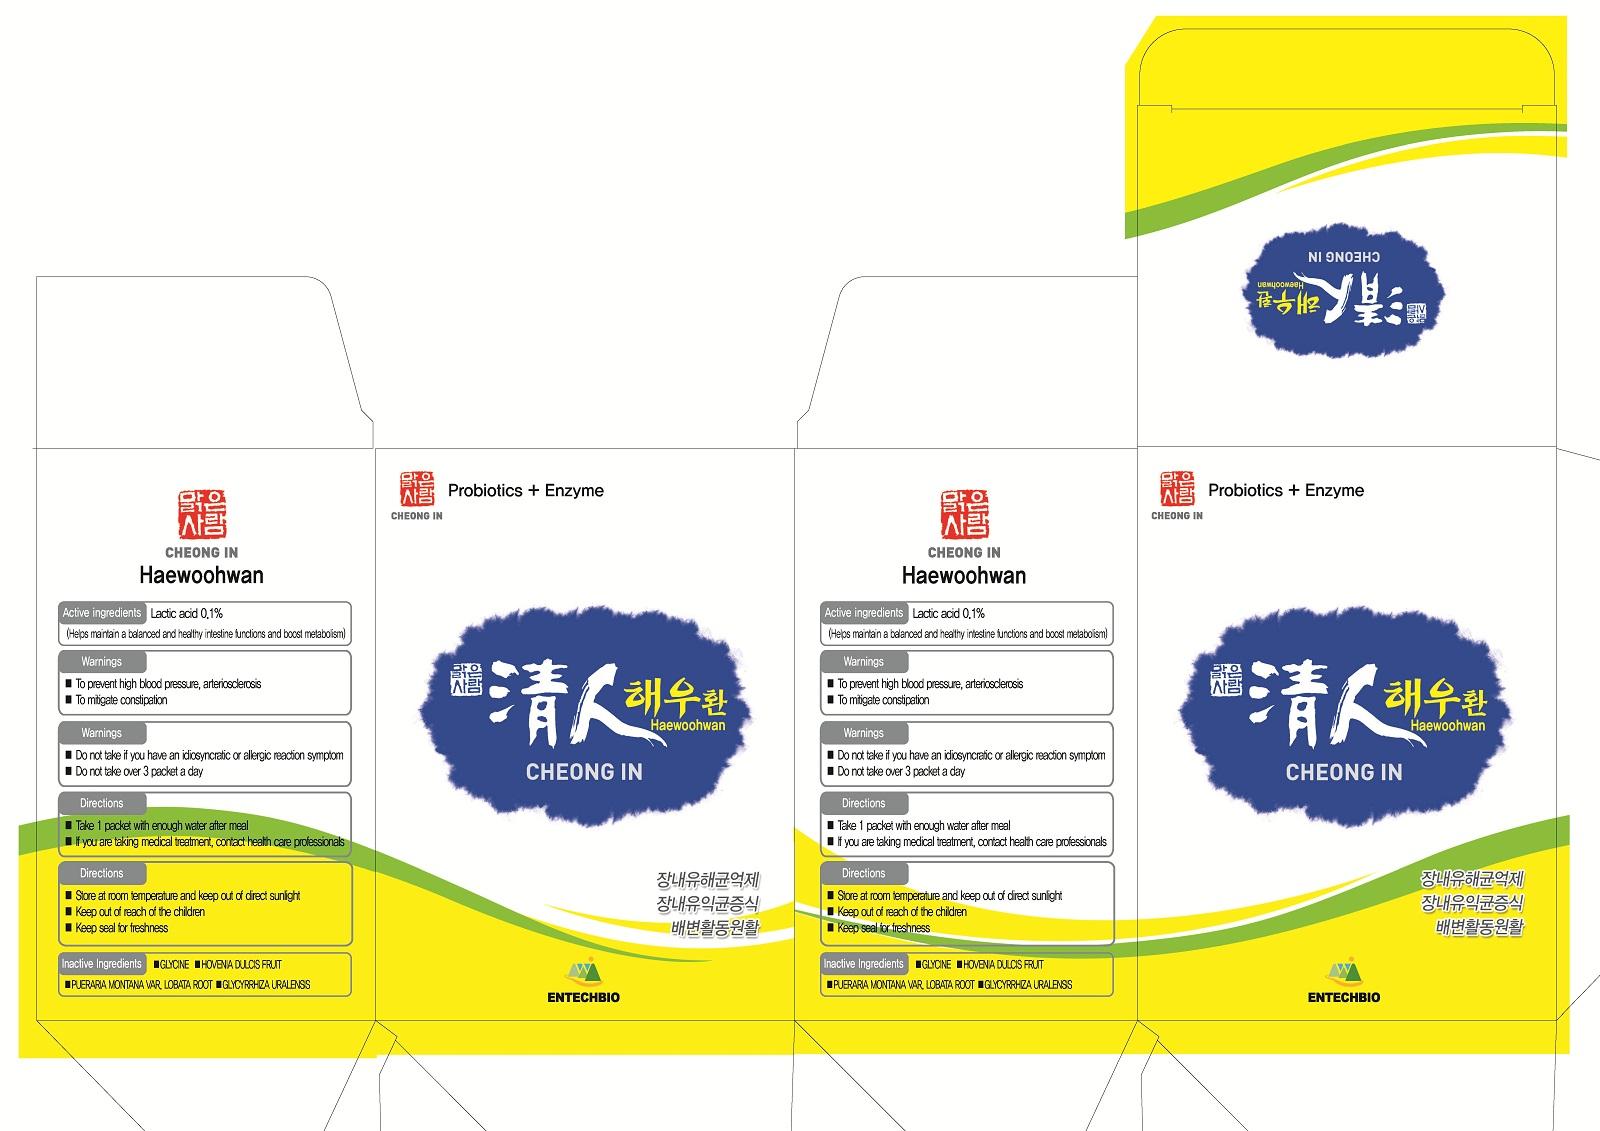 Cheongin Haewoohwan (Lactic Acid) Pellet [Entechbio Co., Ltd]